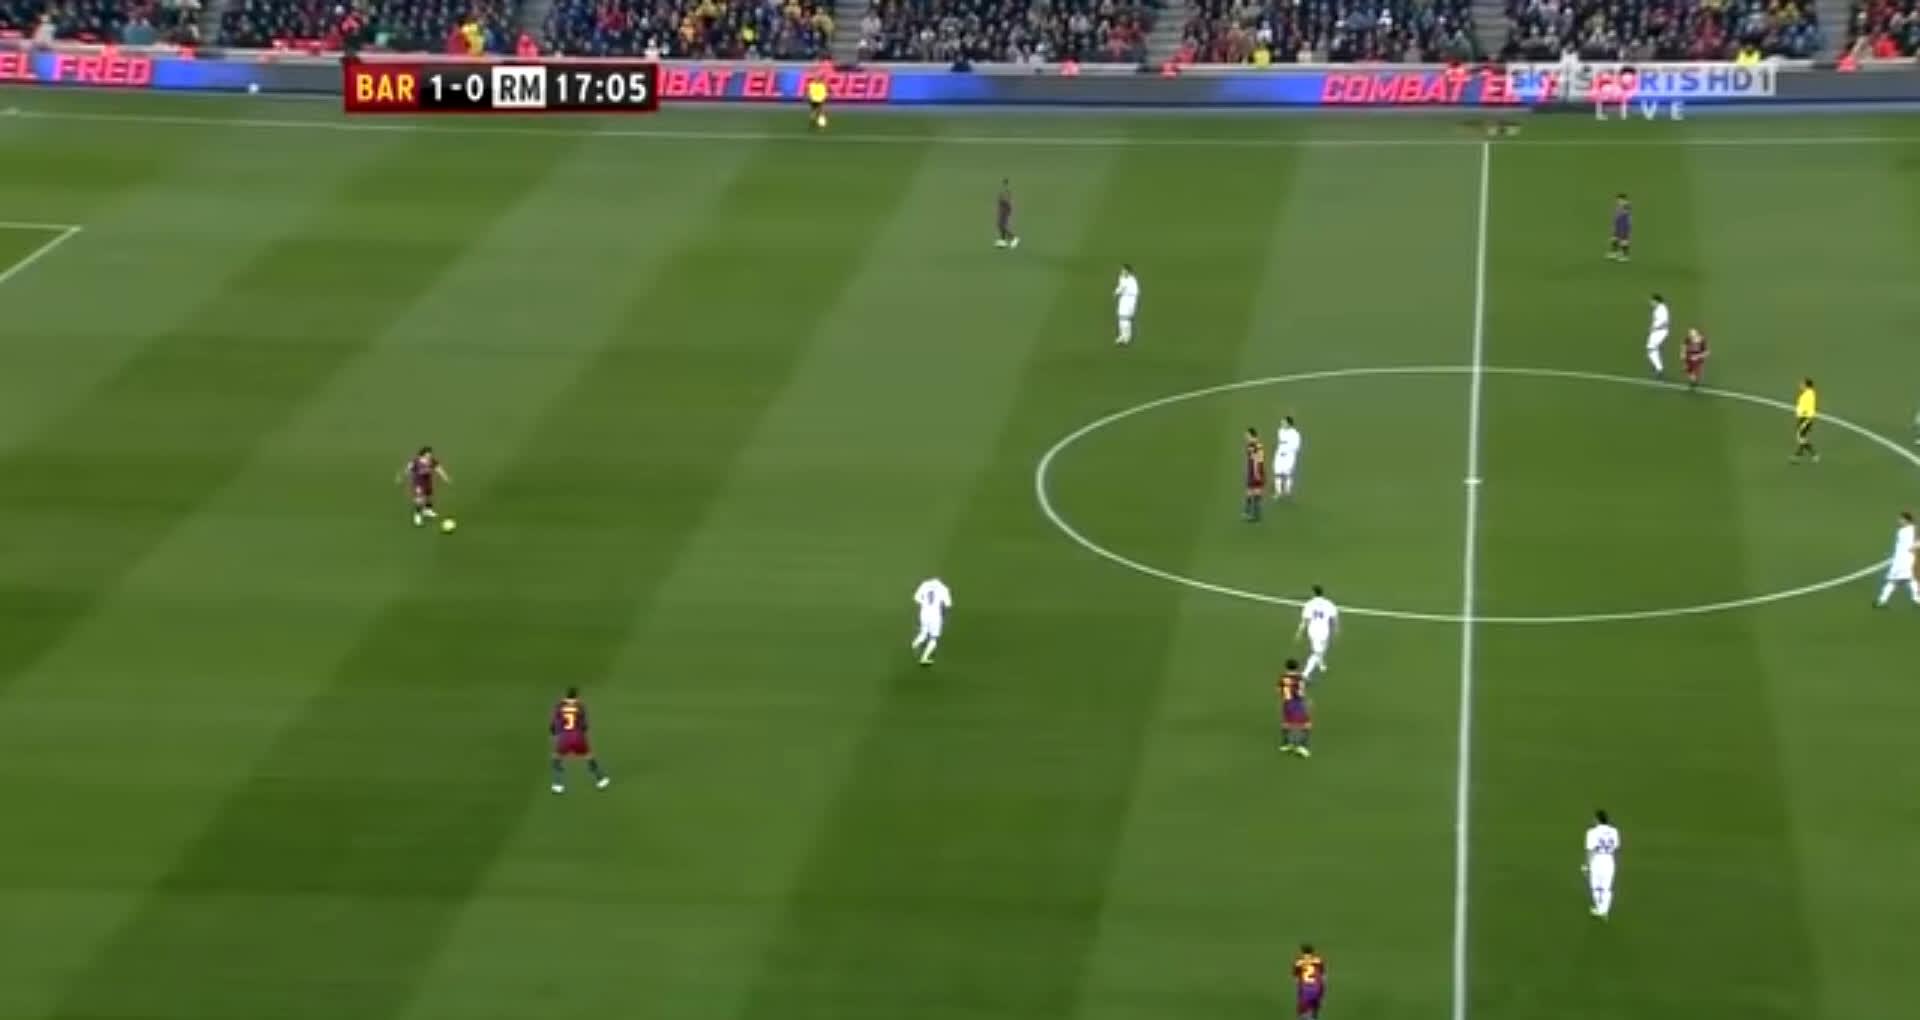 barbados, soccer, Barca gol GIFs